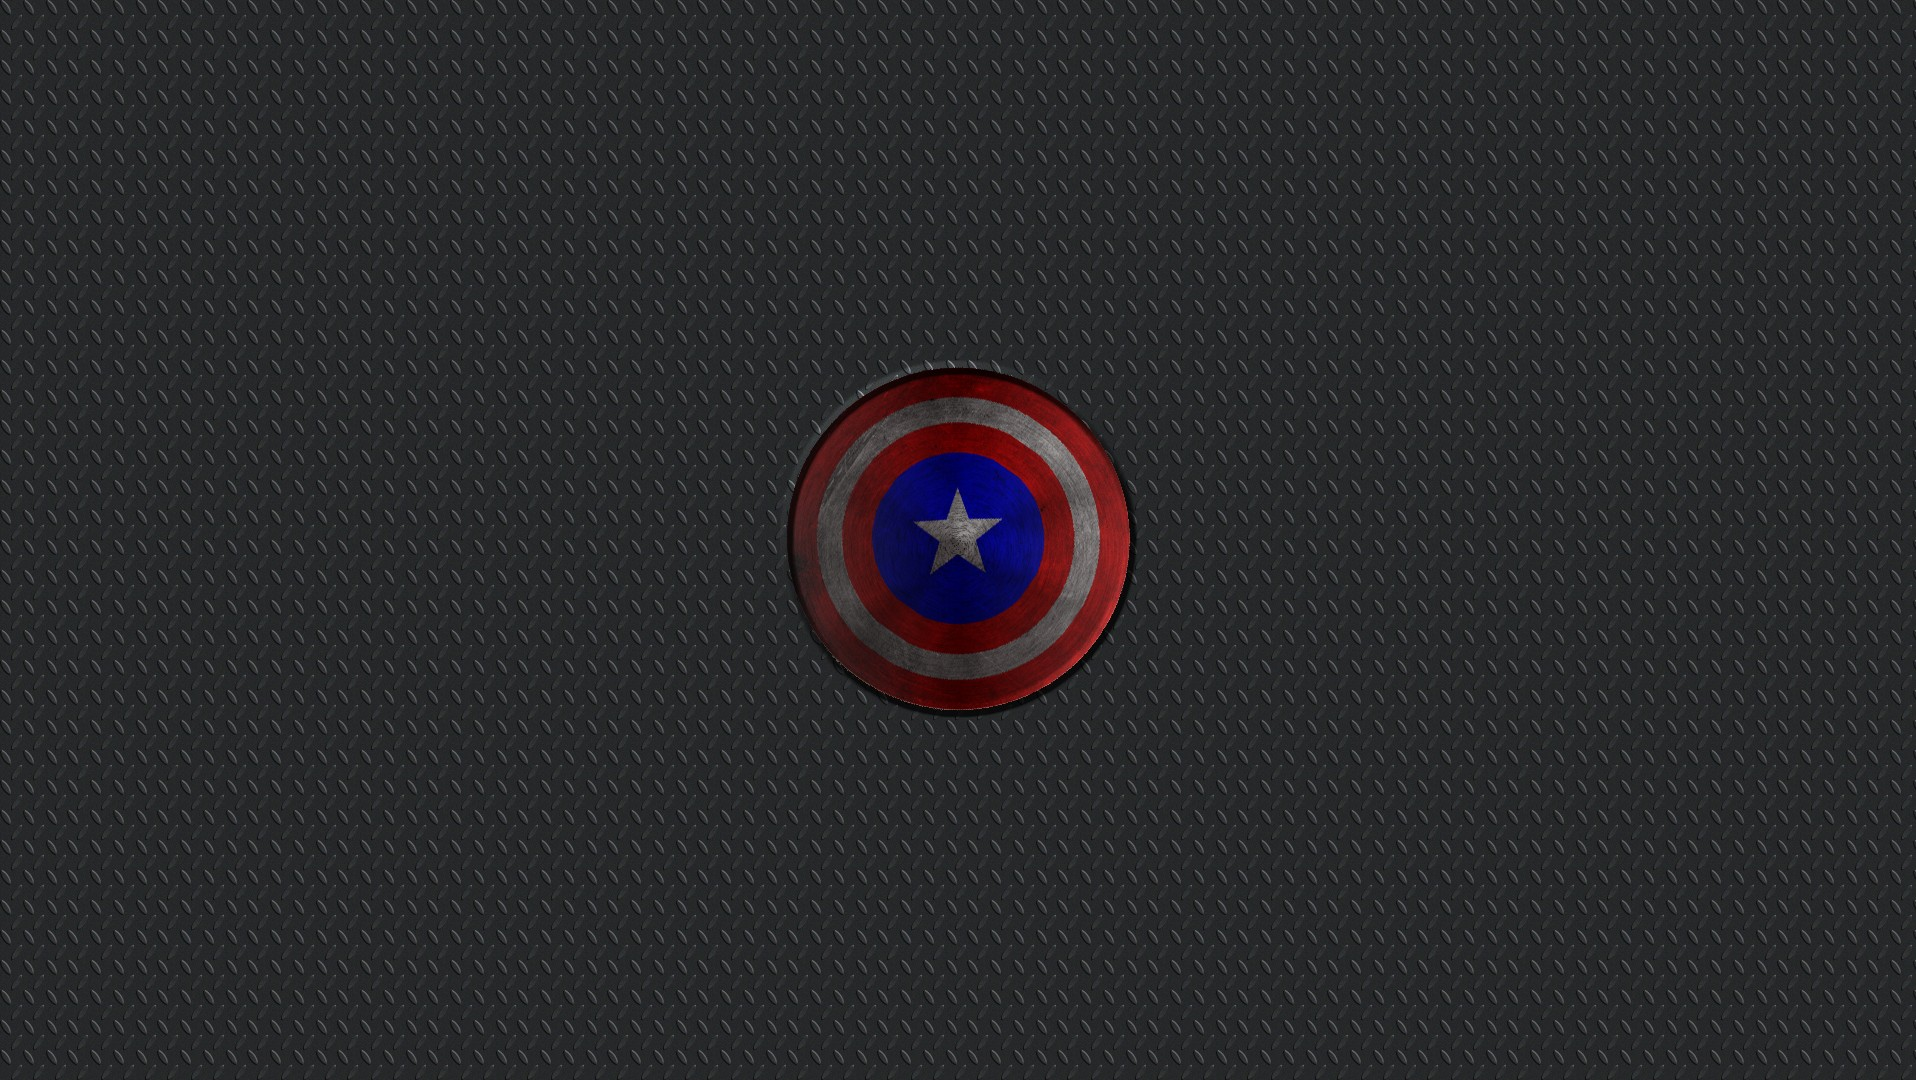 Captain America Shield Iphone Wallpaper Captain america wallpaper 1916x1080